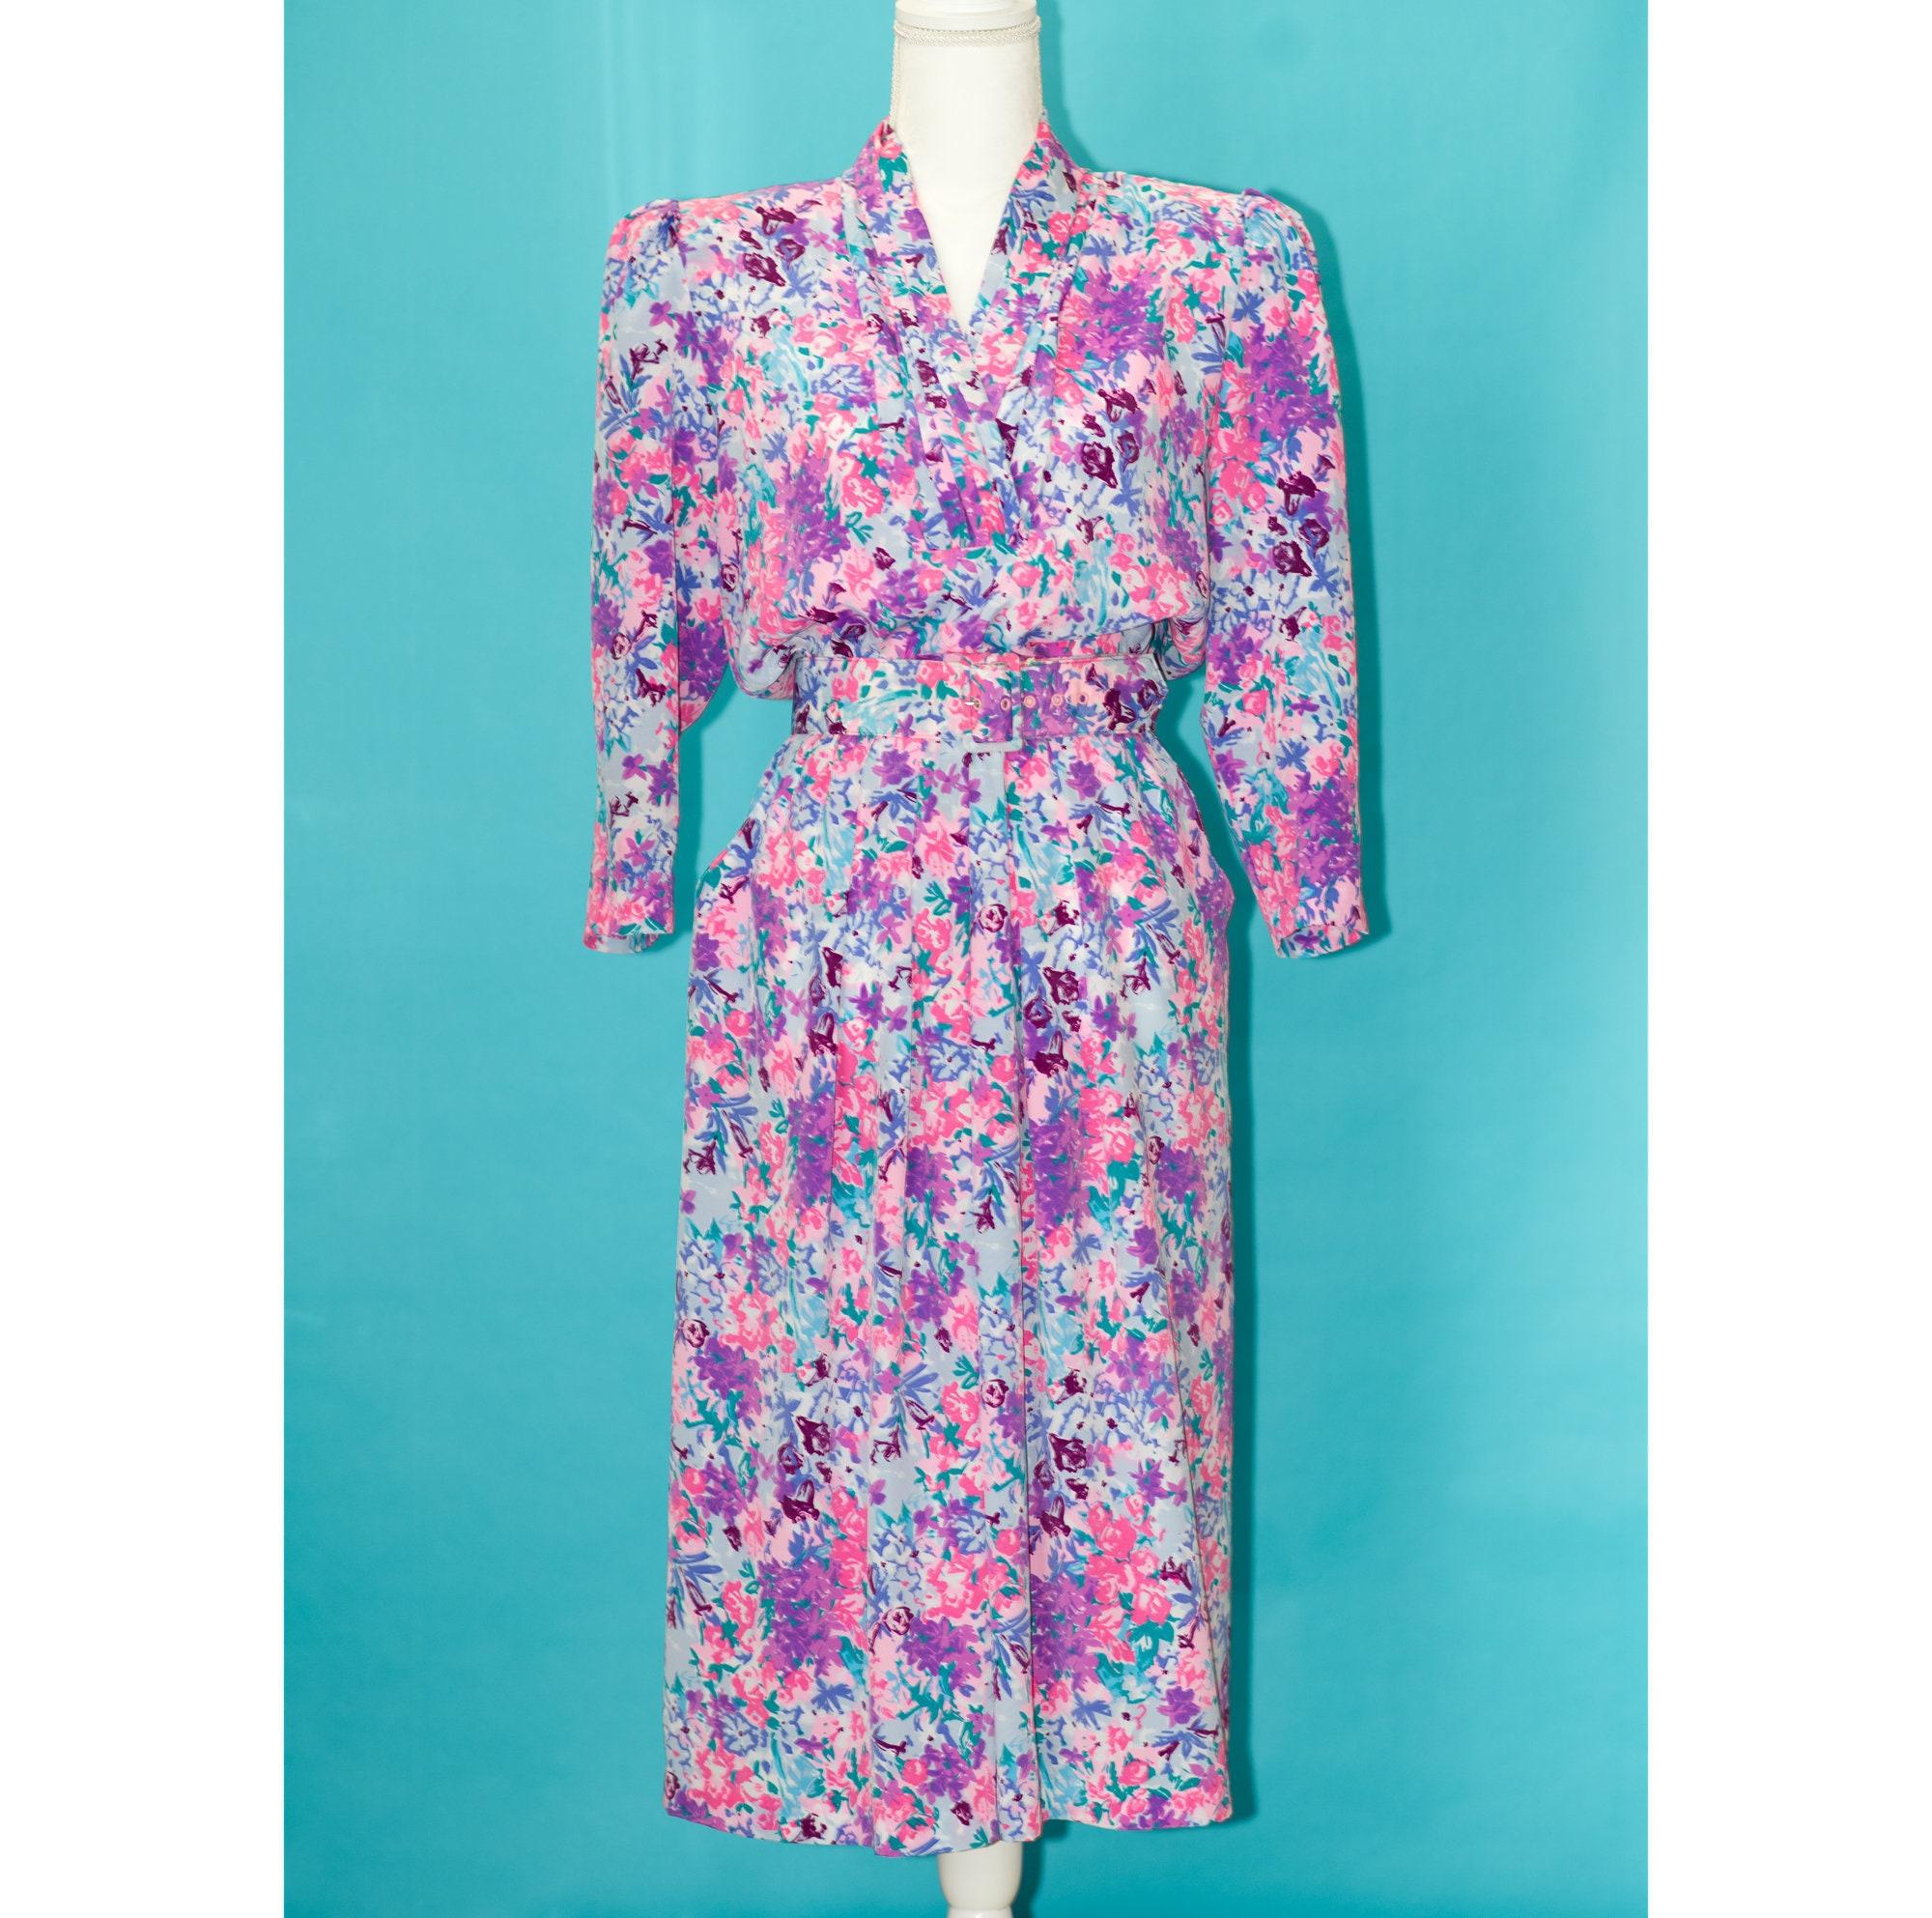 80s Dresses | Casual to Party Dresses Vintage 1980S Pink  Purple Floral Dress  Large $0.00 AT vintagedancer.com